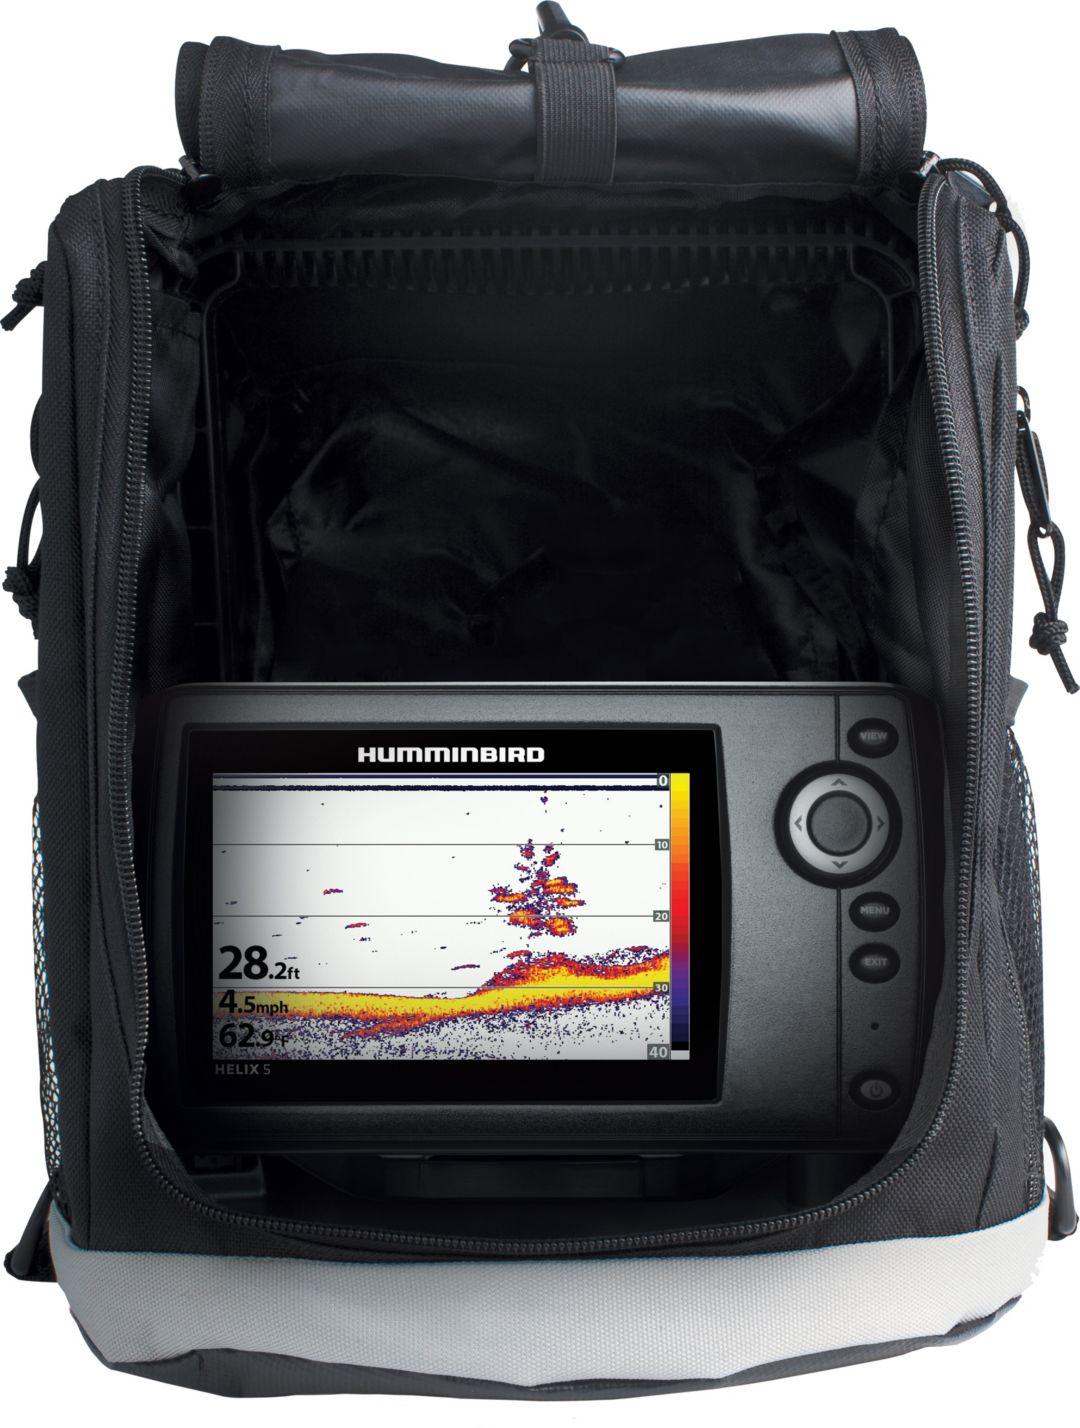 Humminbird Helix 5 Sonar G2 Portable Fish Finder